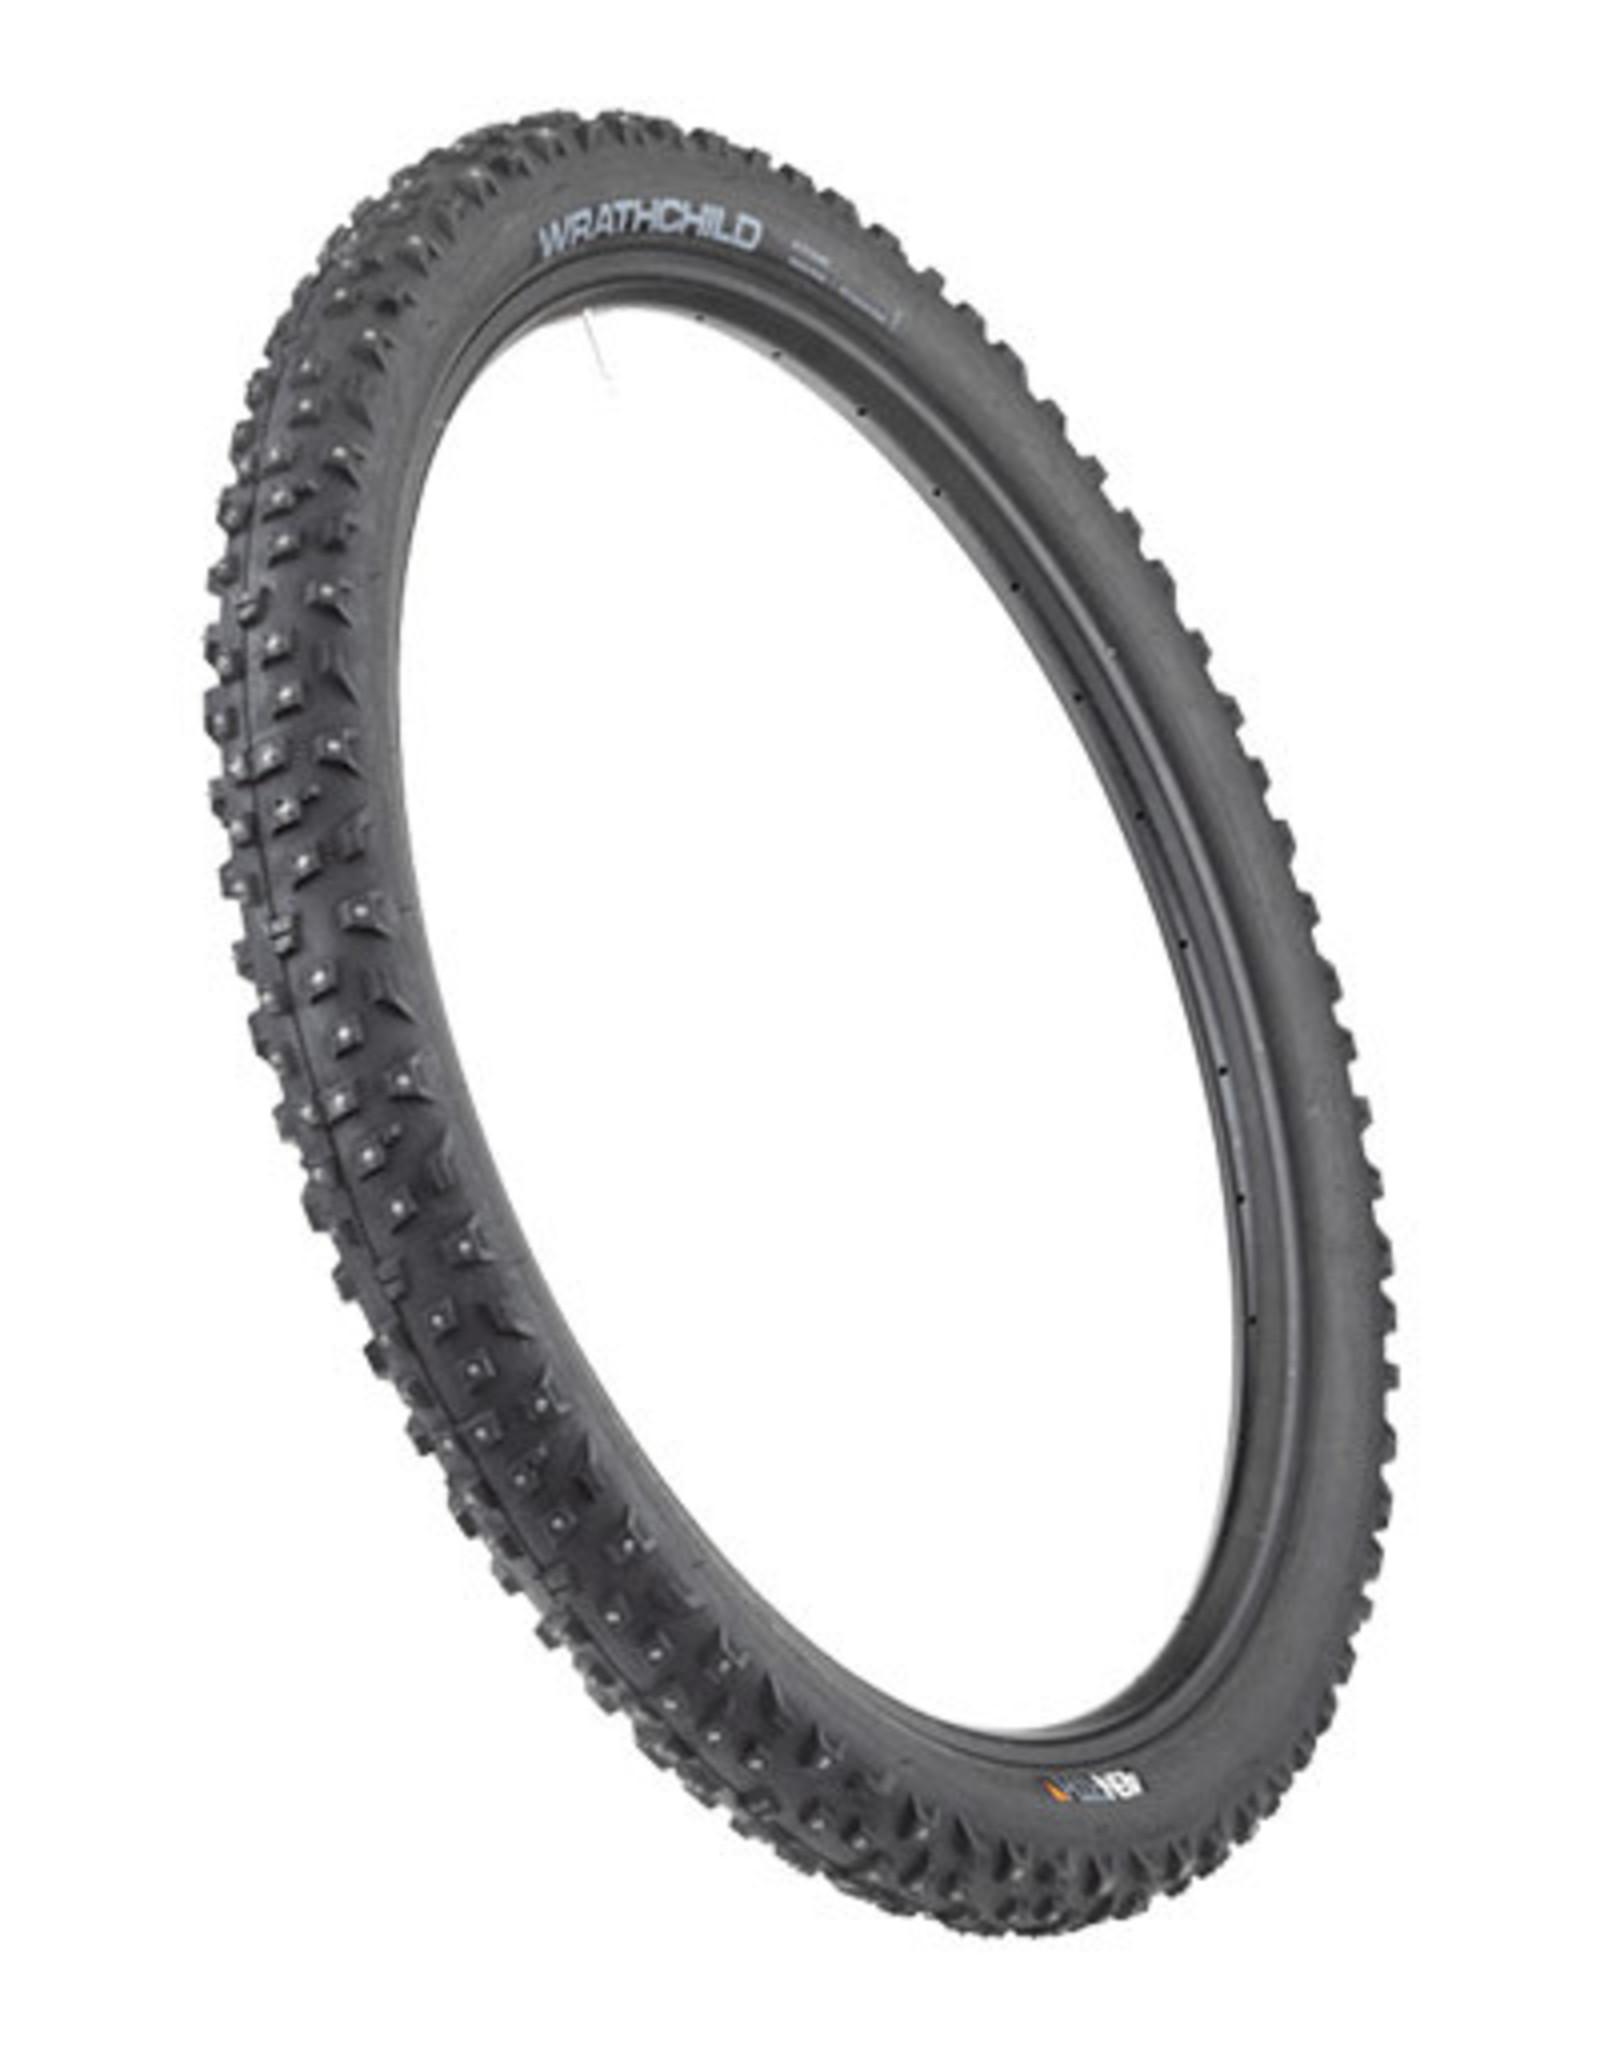 45NRTH 45NRTH Wrathchild Tire - 29 x 2.6, Tubeless, Folding, Black, 120tpi, 252 XL Concave Carbide Aluminum Studs